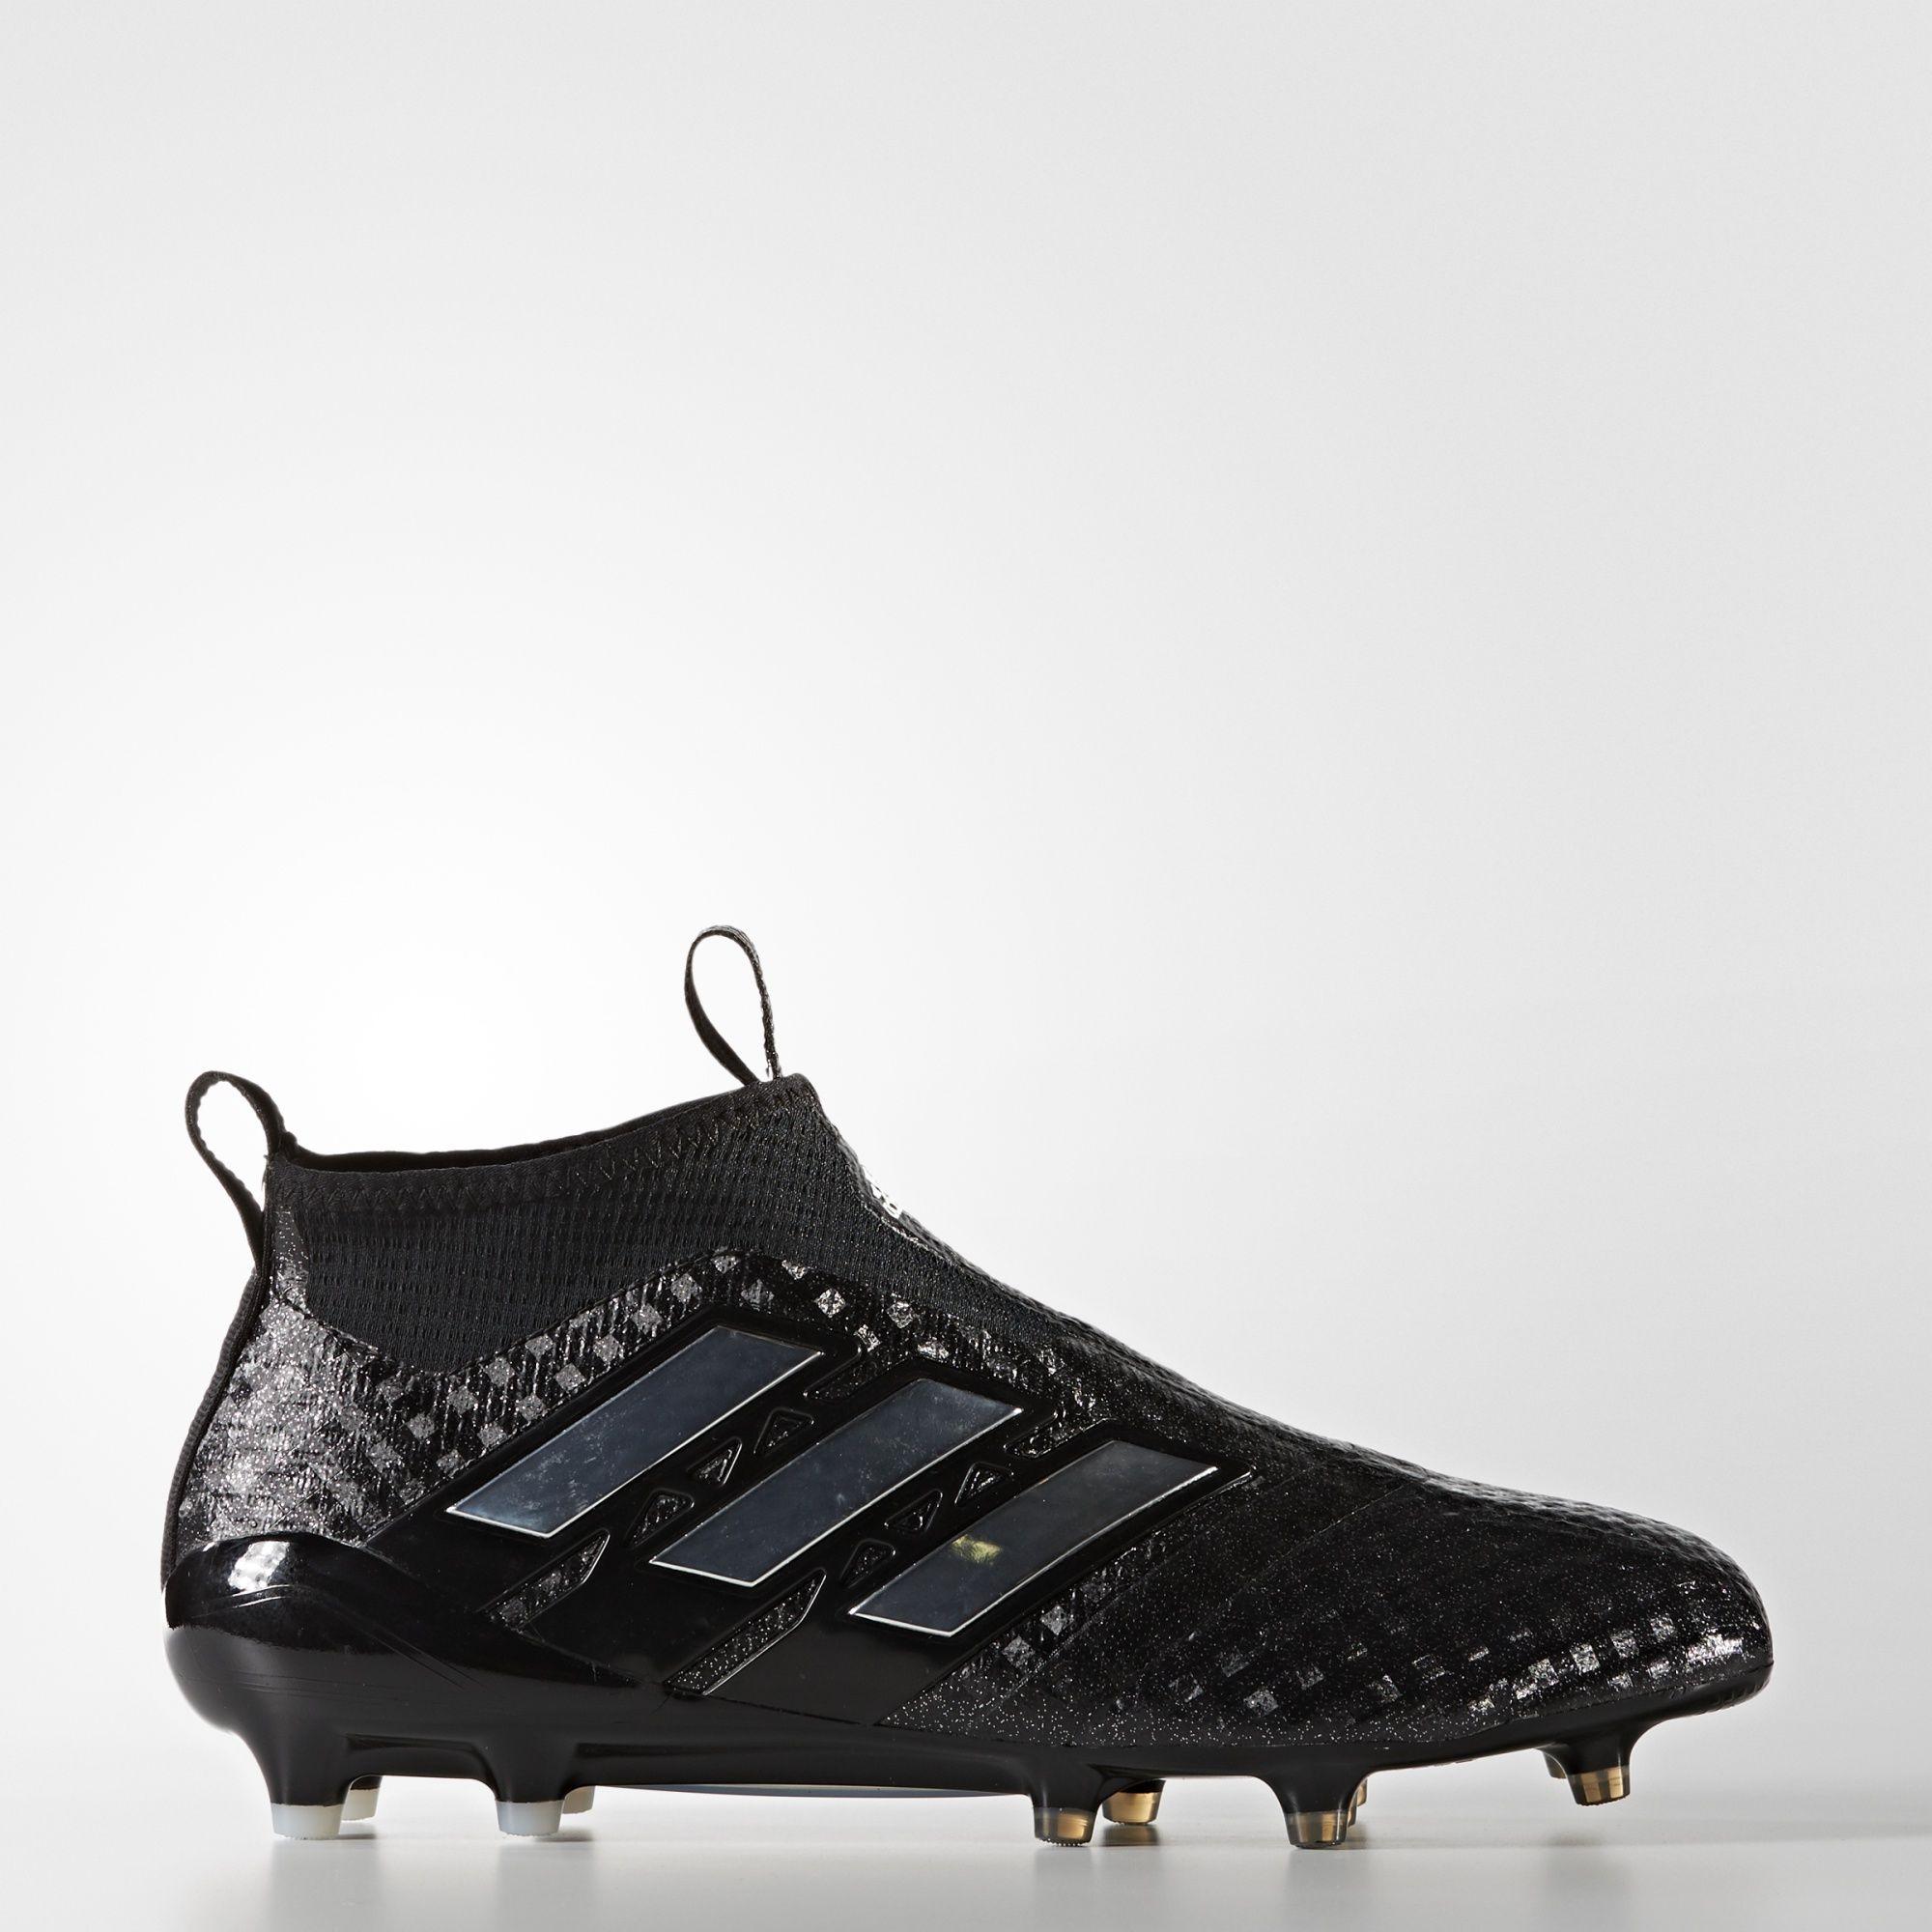 sale retailer a4a0f a063a adidas Ace 17+ PURECONTROL FG - Black White